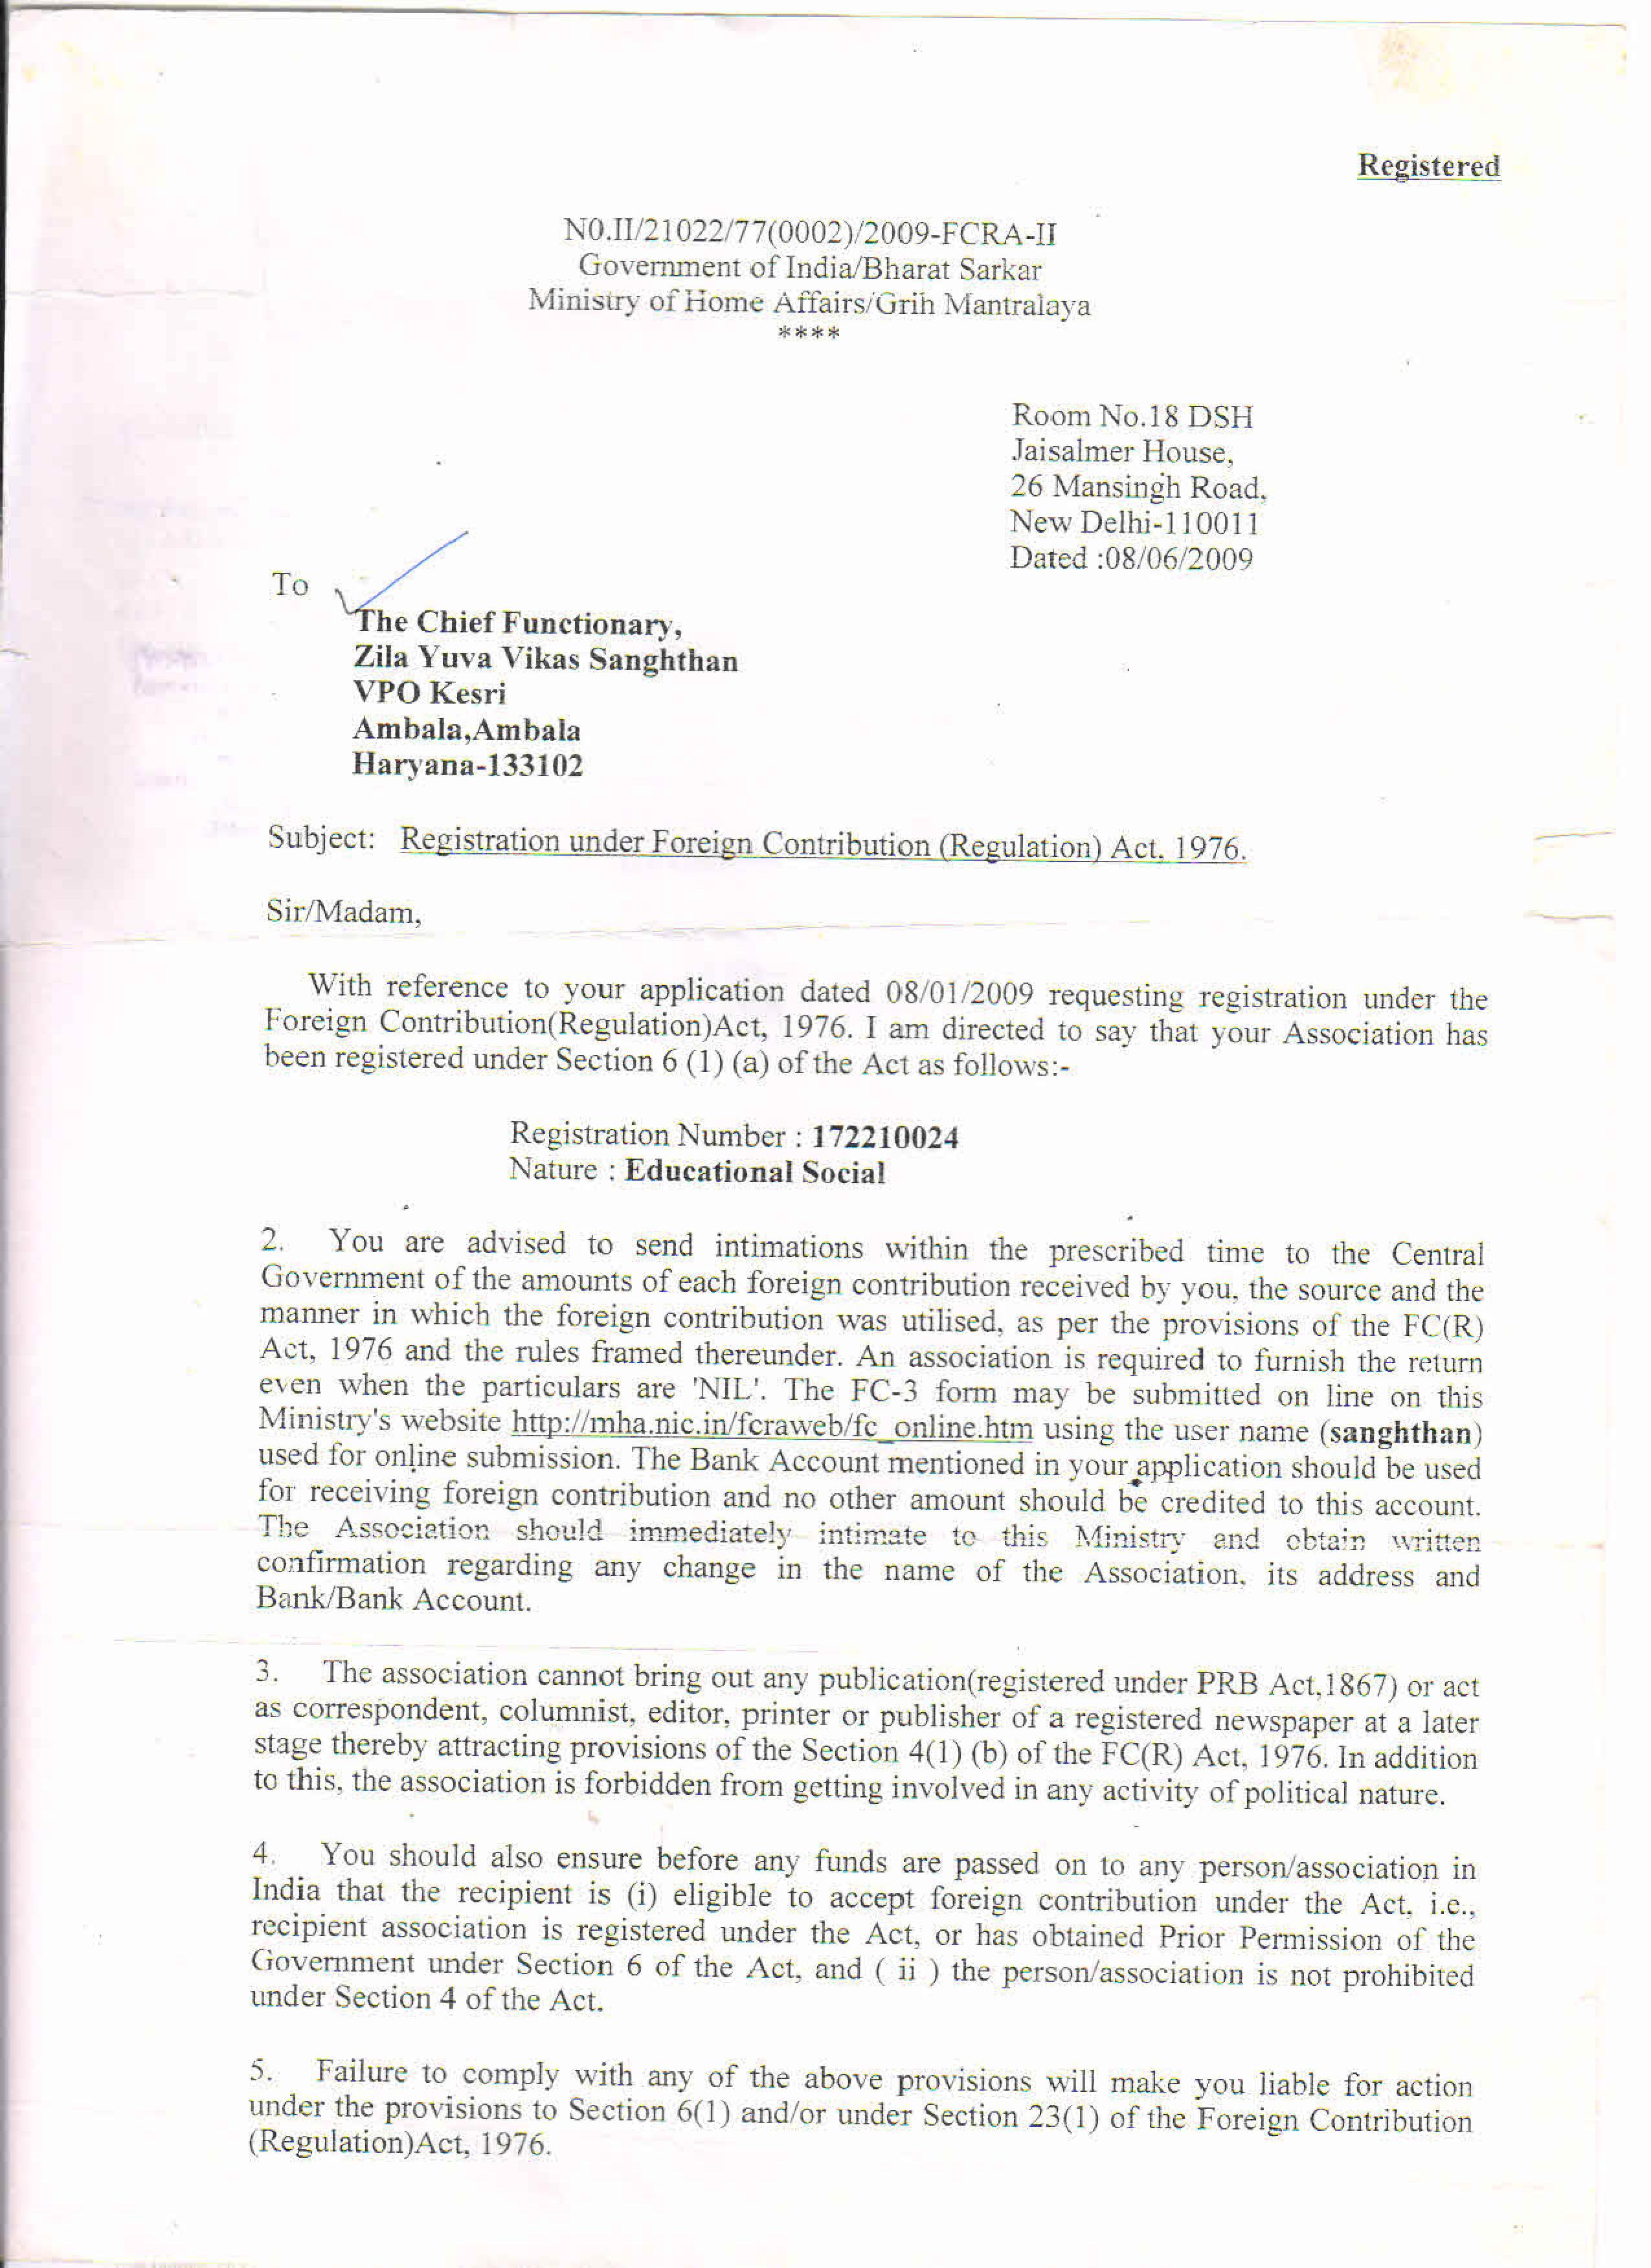 Zila Yuva Vikas Sanghthan NGO - Help with legal documents